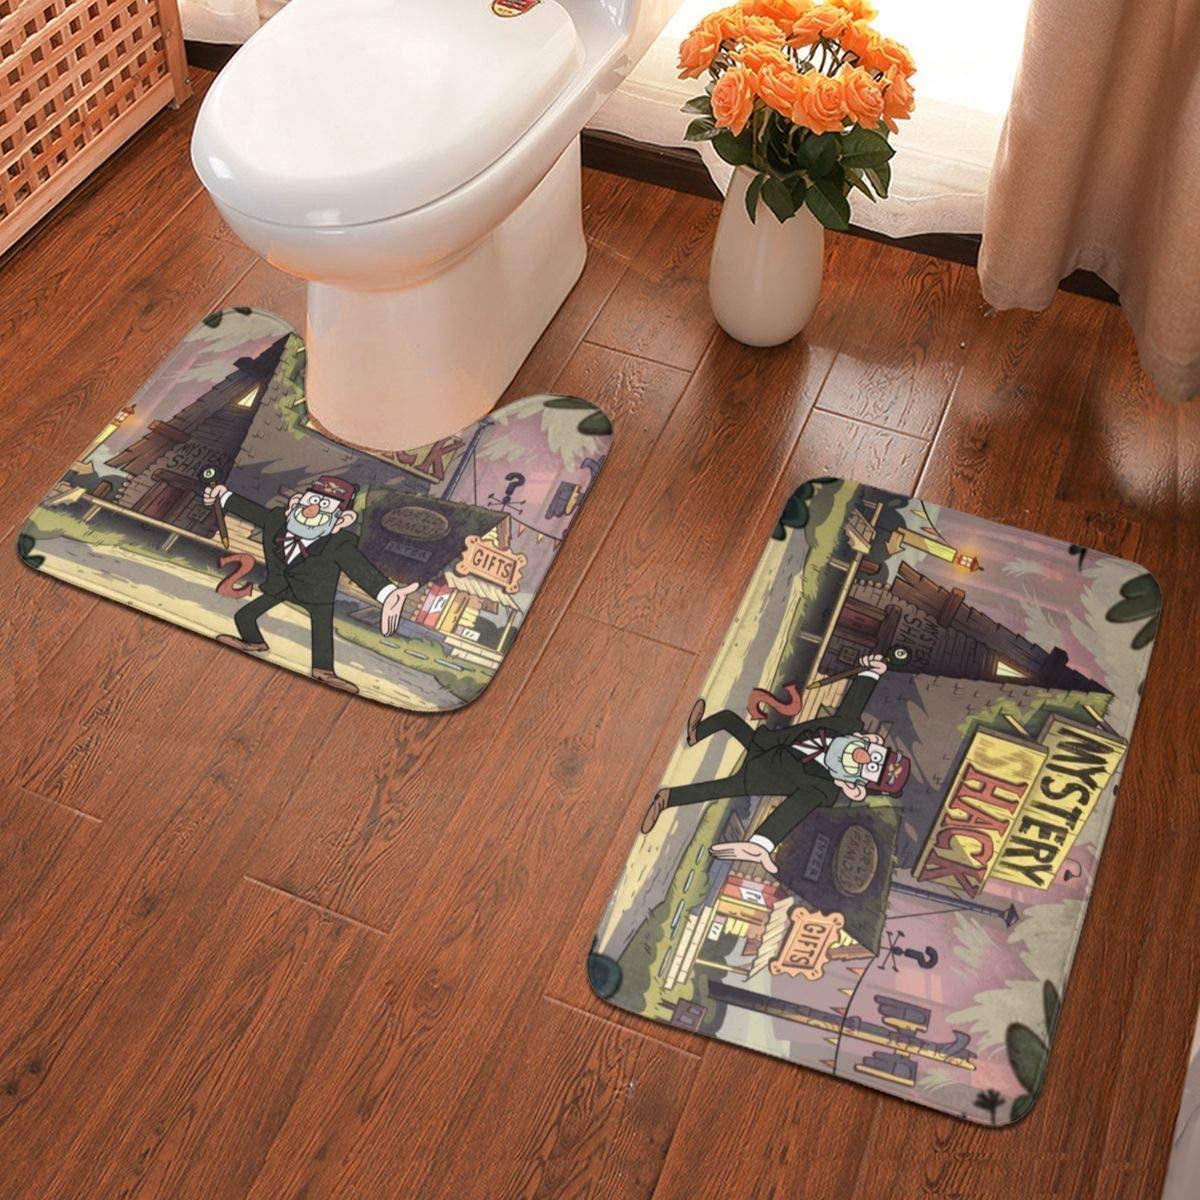 Boweike Gravity Falls Bathroom Antiskid Pad Non-Slip Bath Carpet Floor Mat Rug 2 Sets -Floor Mat+U-Shaped Pad, Toilet Washable Blanket Mats for Bathroom Home Shower